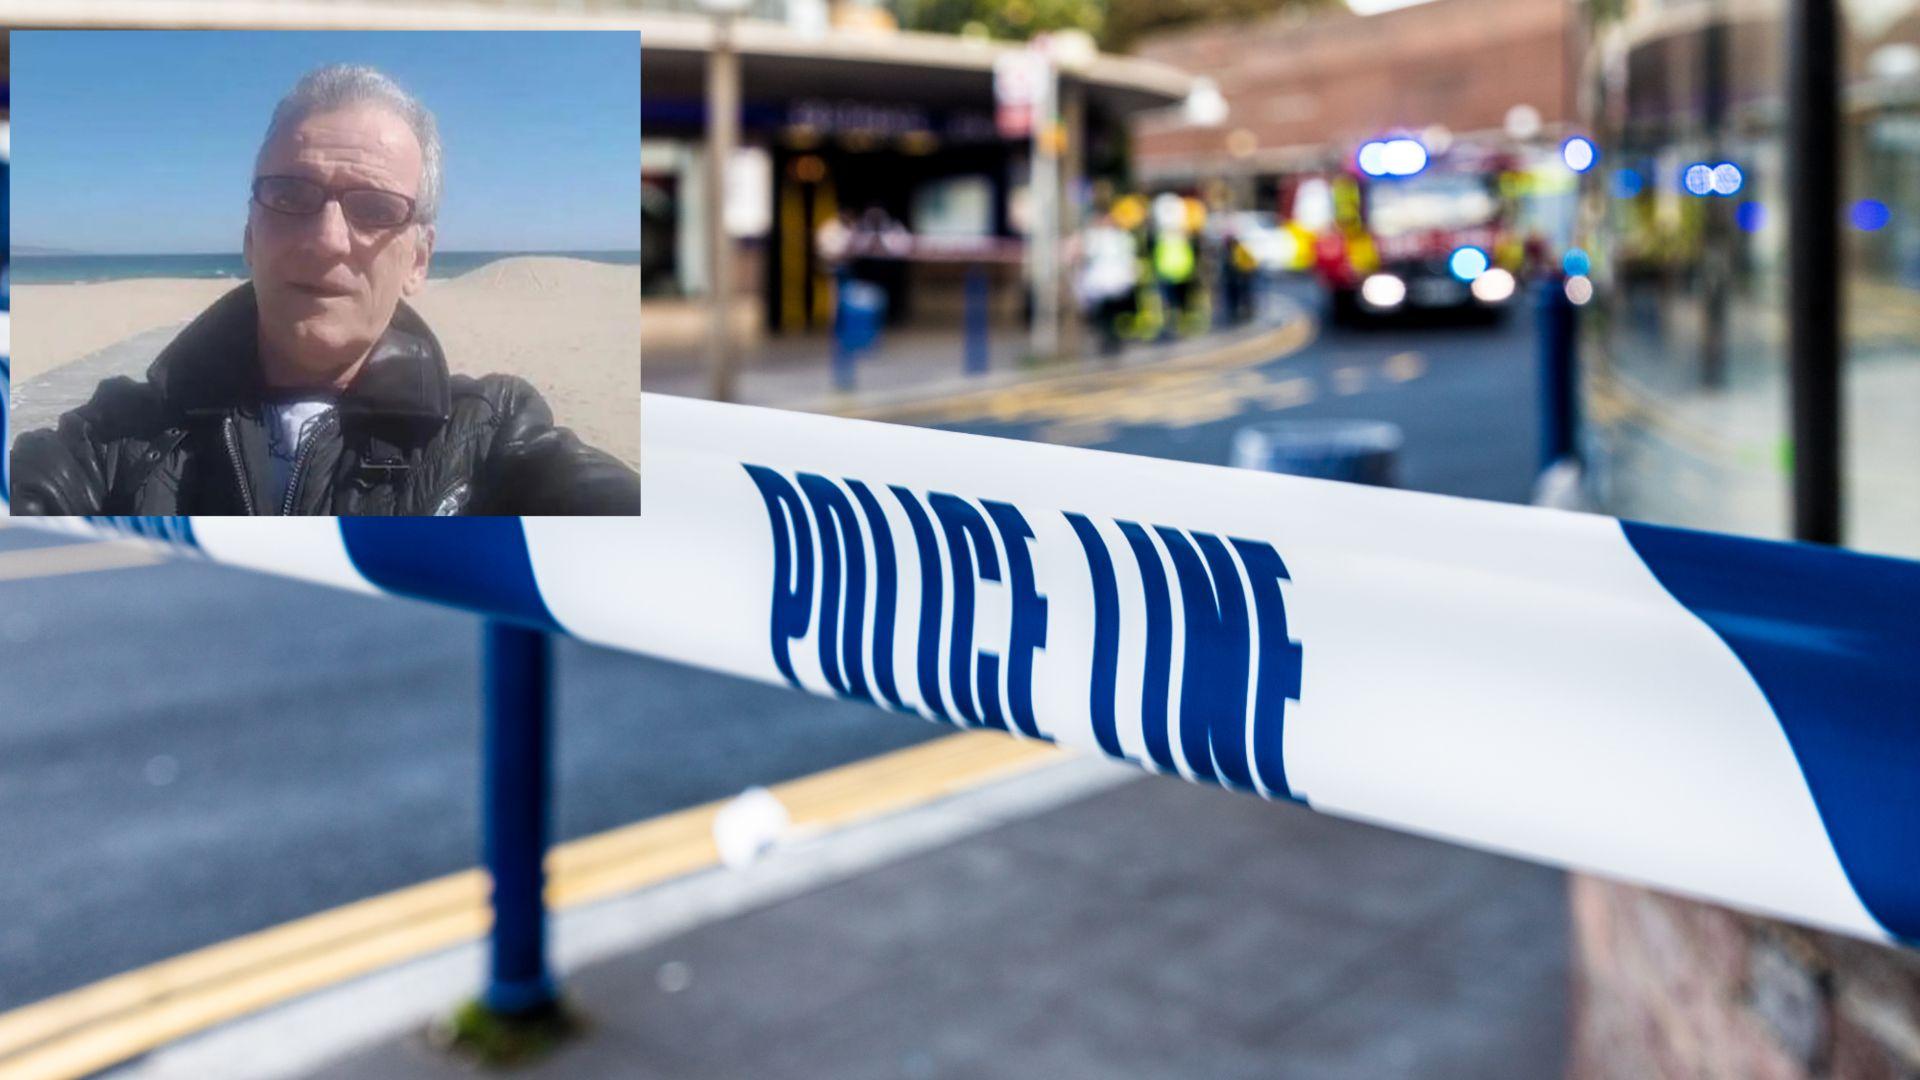 Друг българин убил Красимир Къртиков в Лондон (снимки)